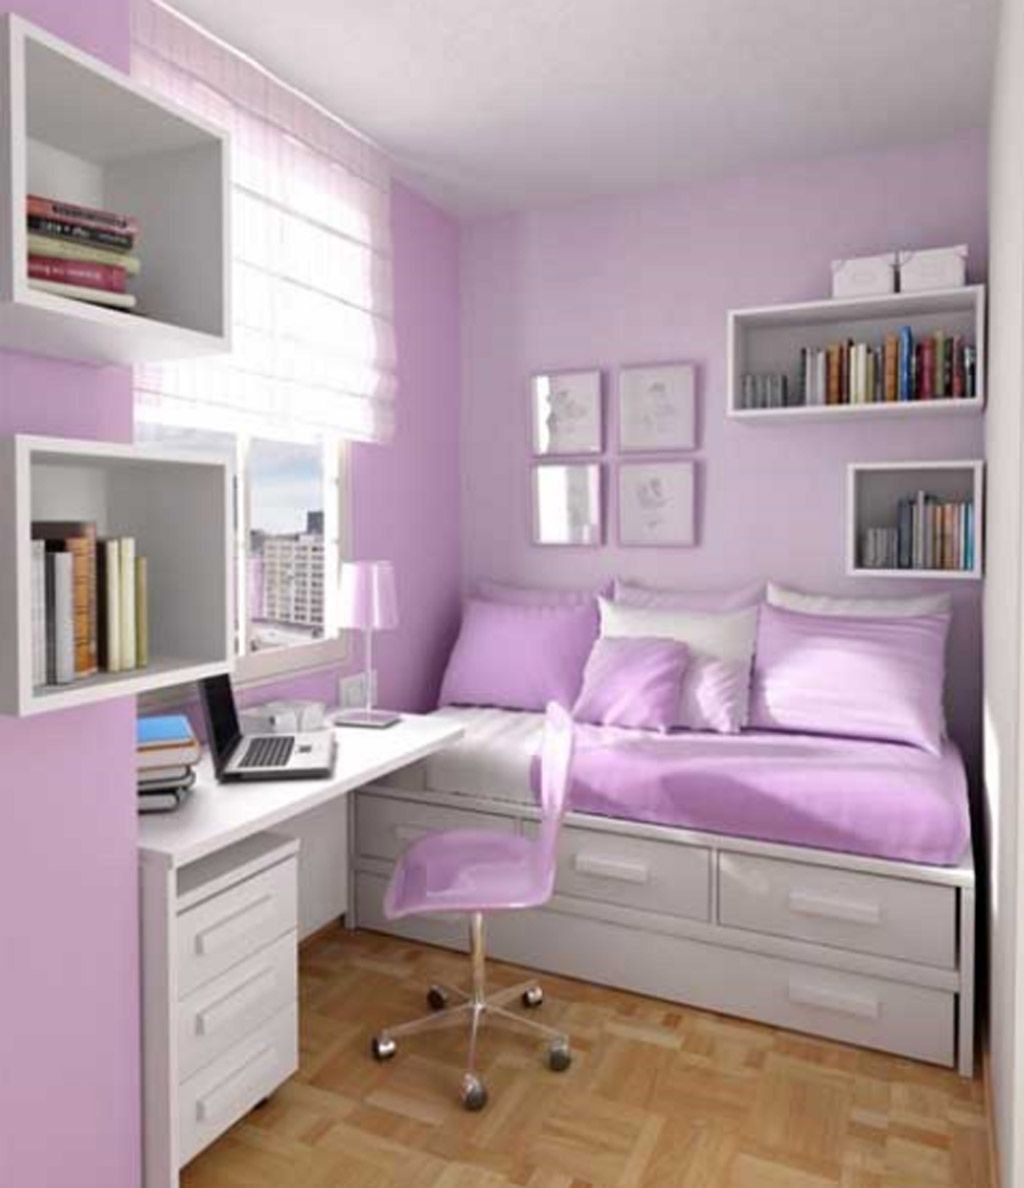 Fullsize Of Pics Of Teenage Bedrooms